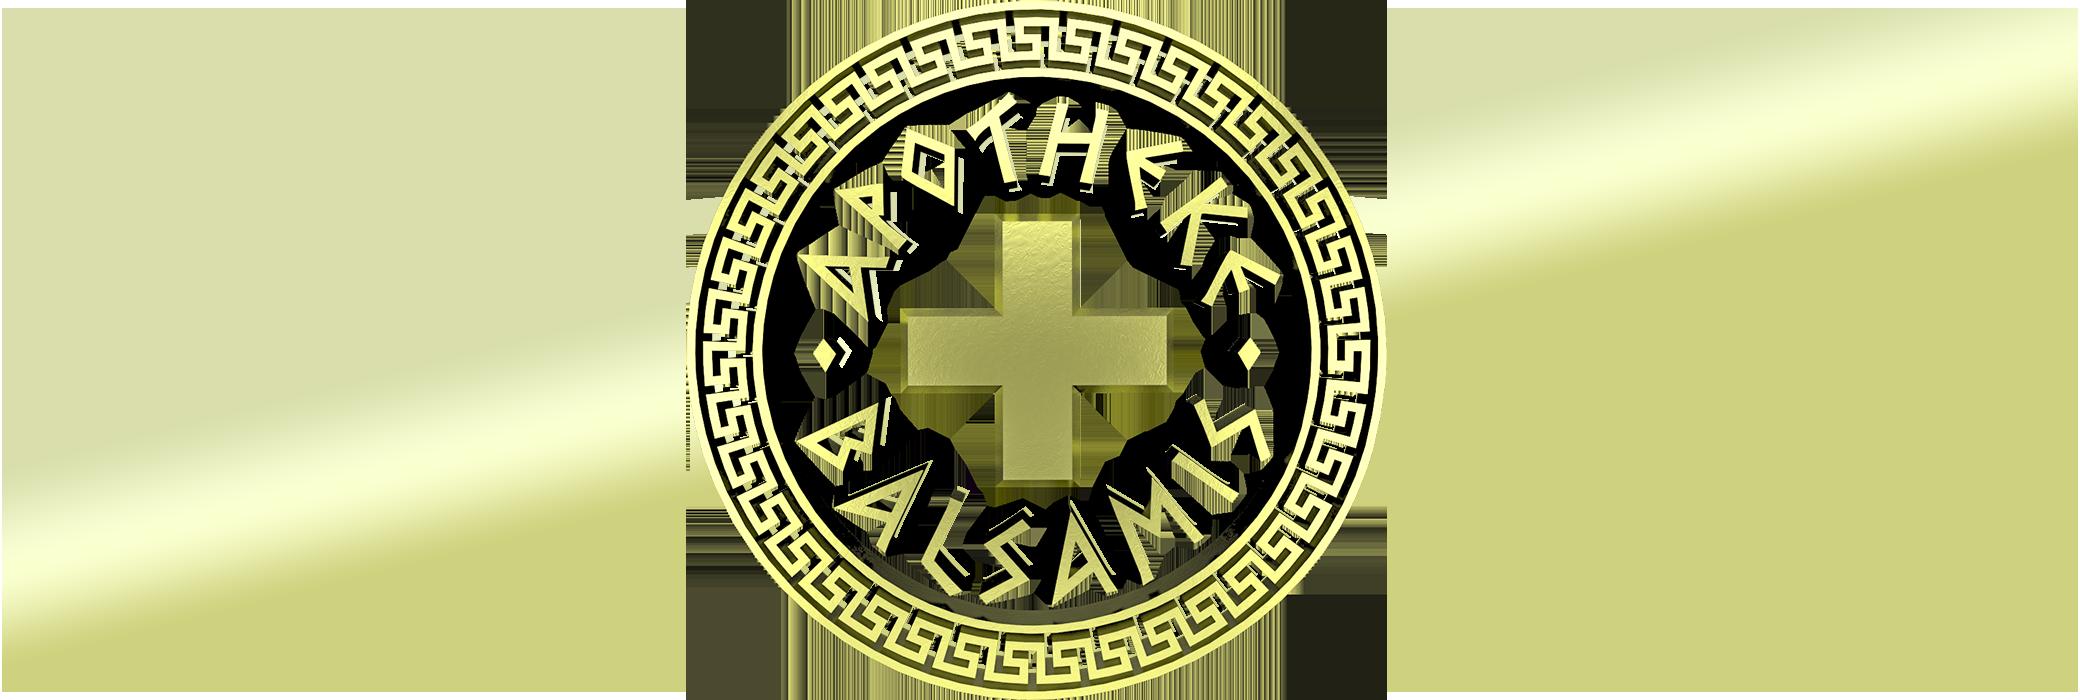 Balsamis Apotheke